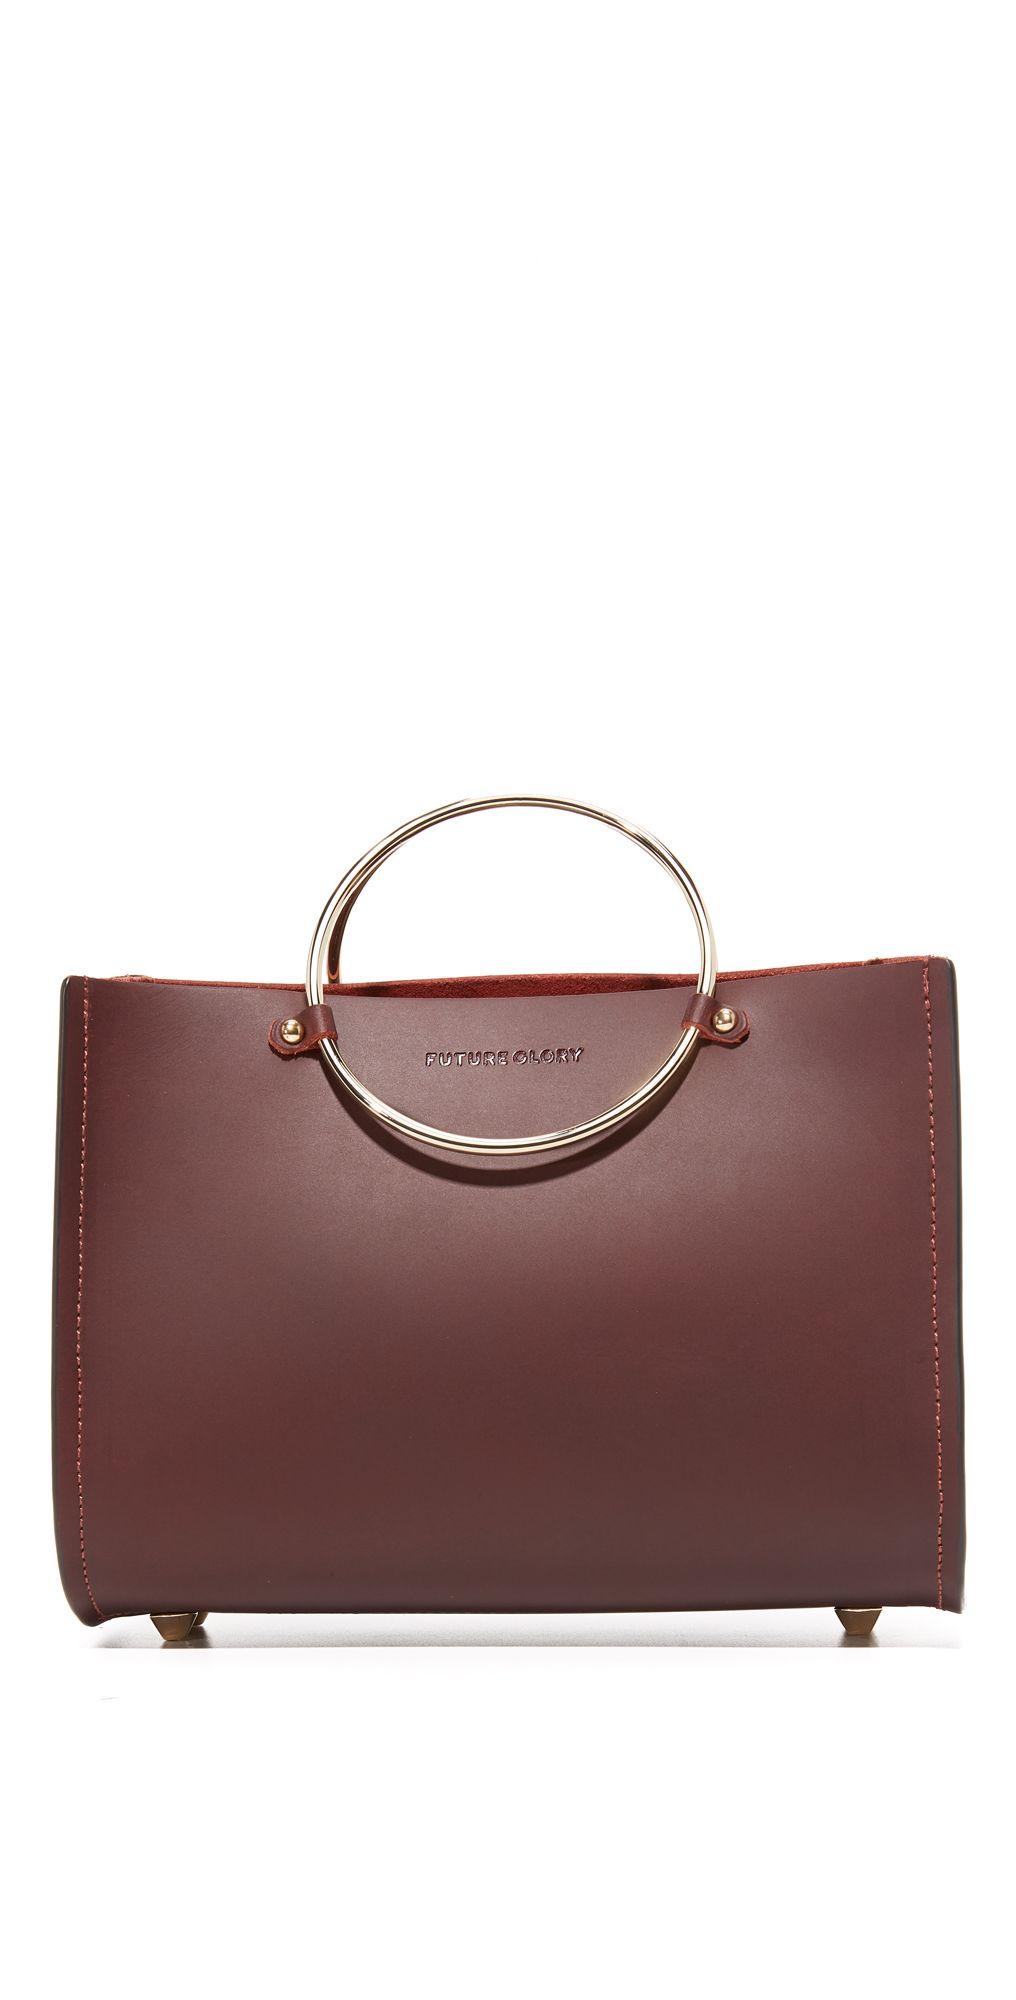 Future glory co rockwell mini bag shopbop mini bag